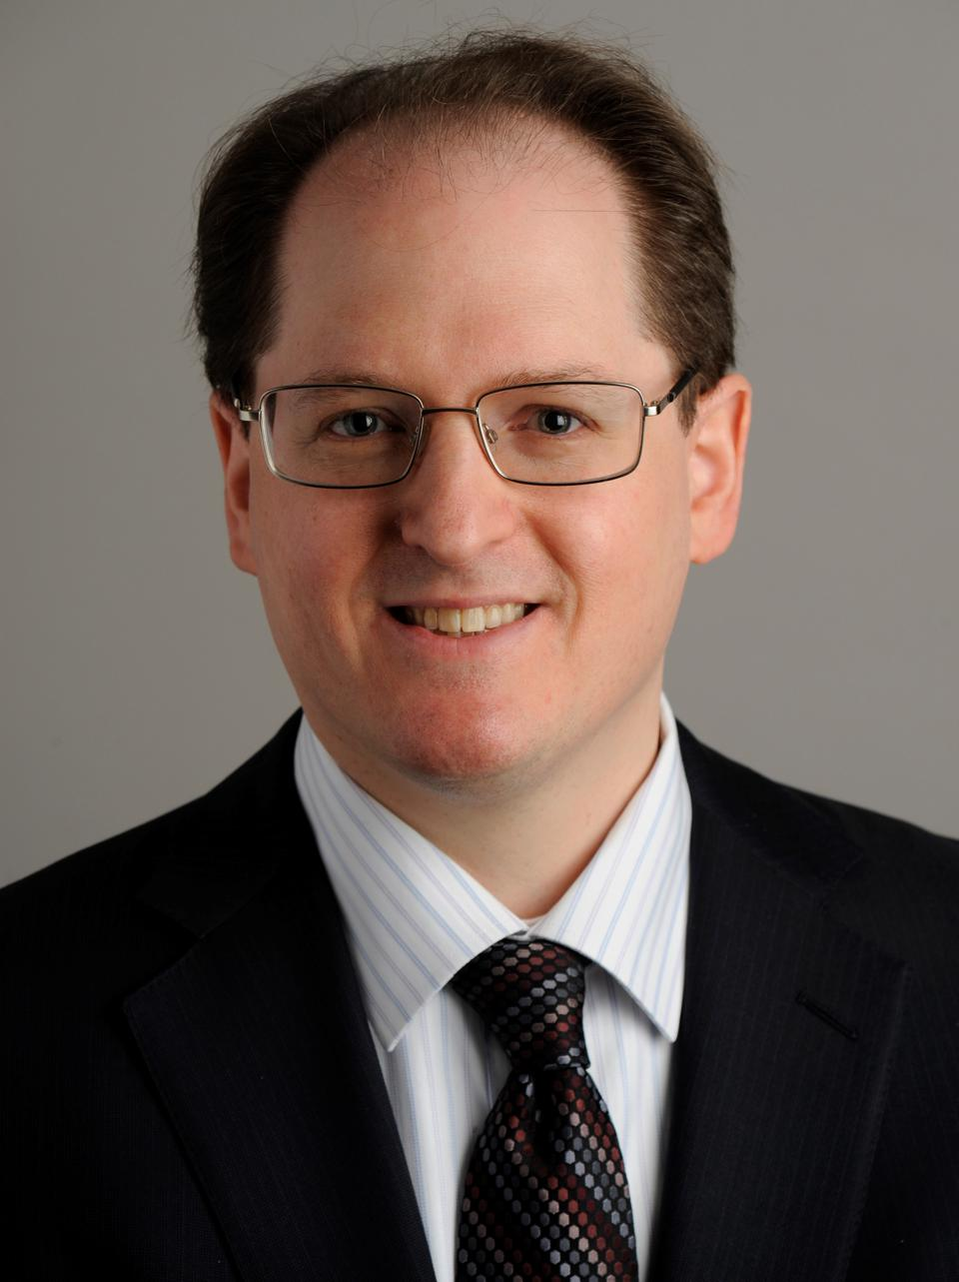 Evan Friedman, Senior Vice President